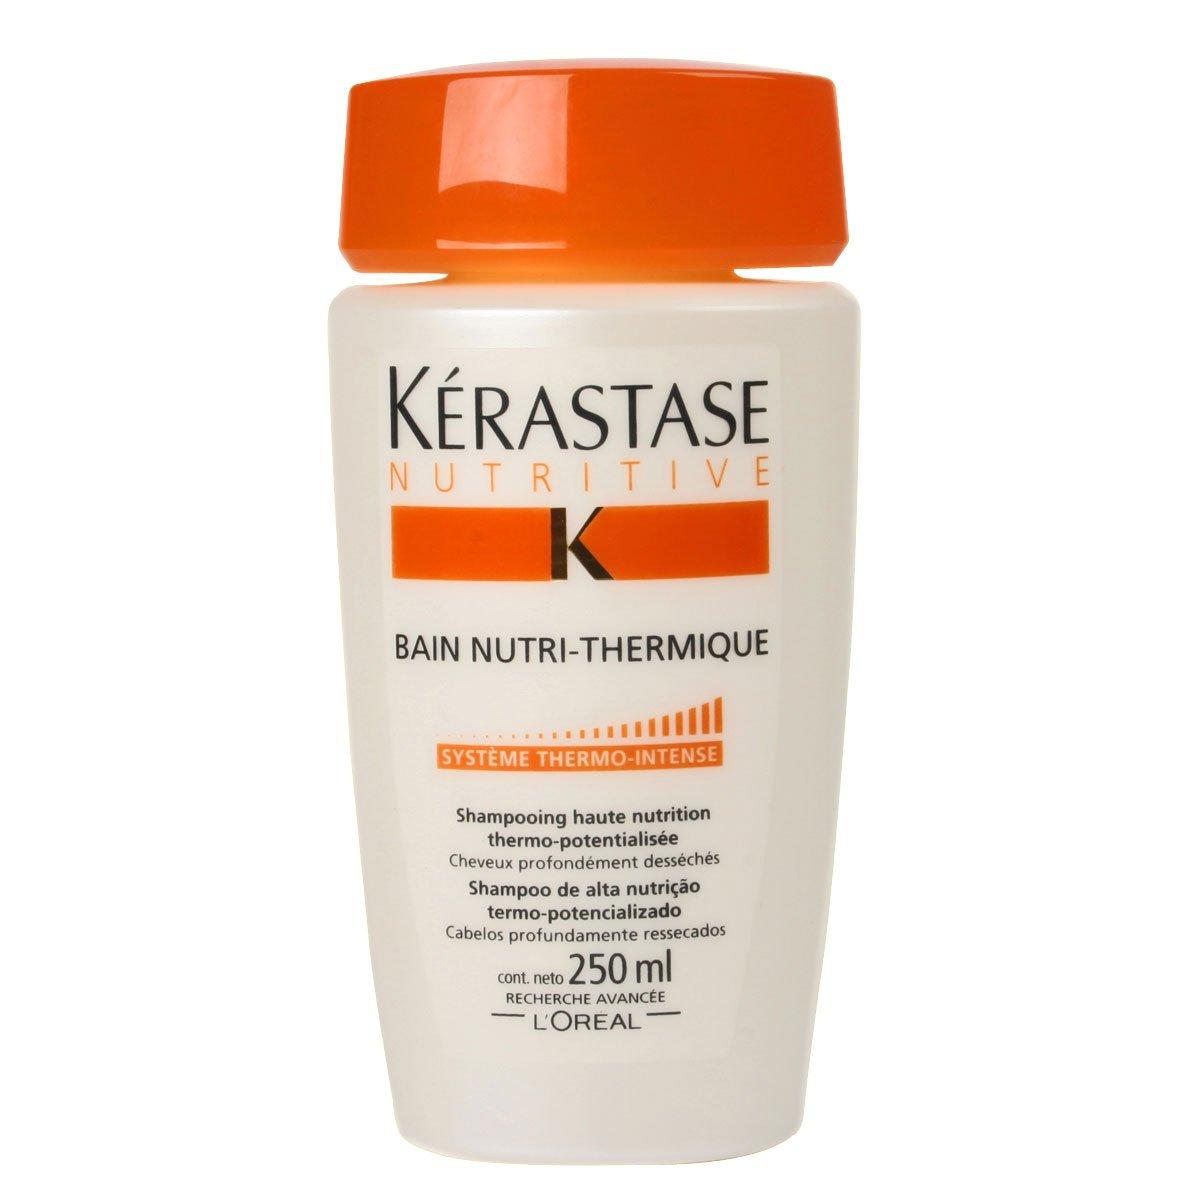 kerastase nutritive bain nutri thermique intensive nutrition shampoo for very dr 3474630313743. Black Bedroom Furniture Sets. Home Design Ideas